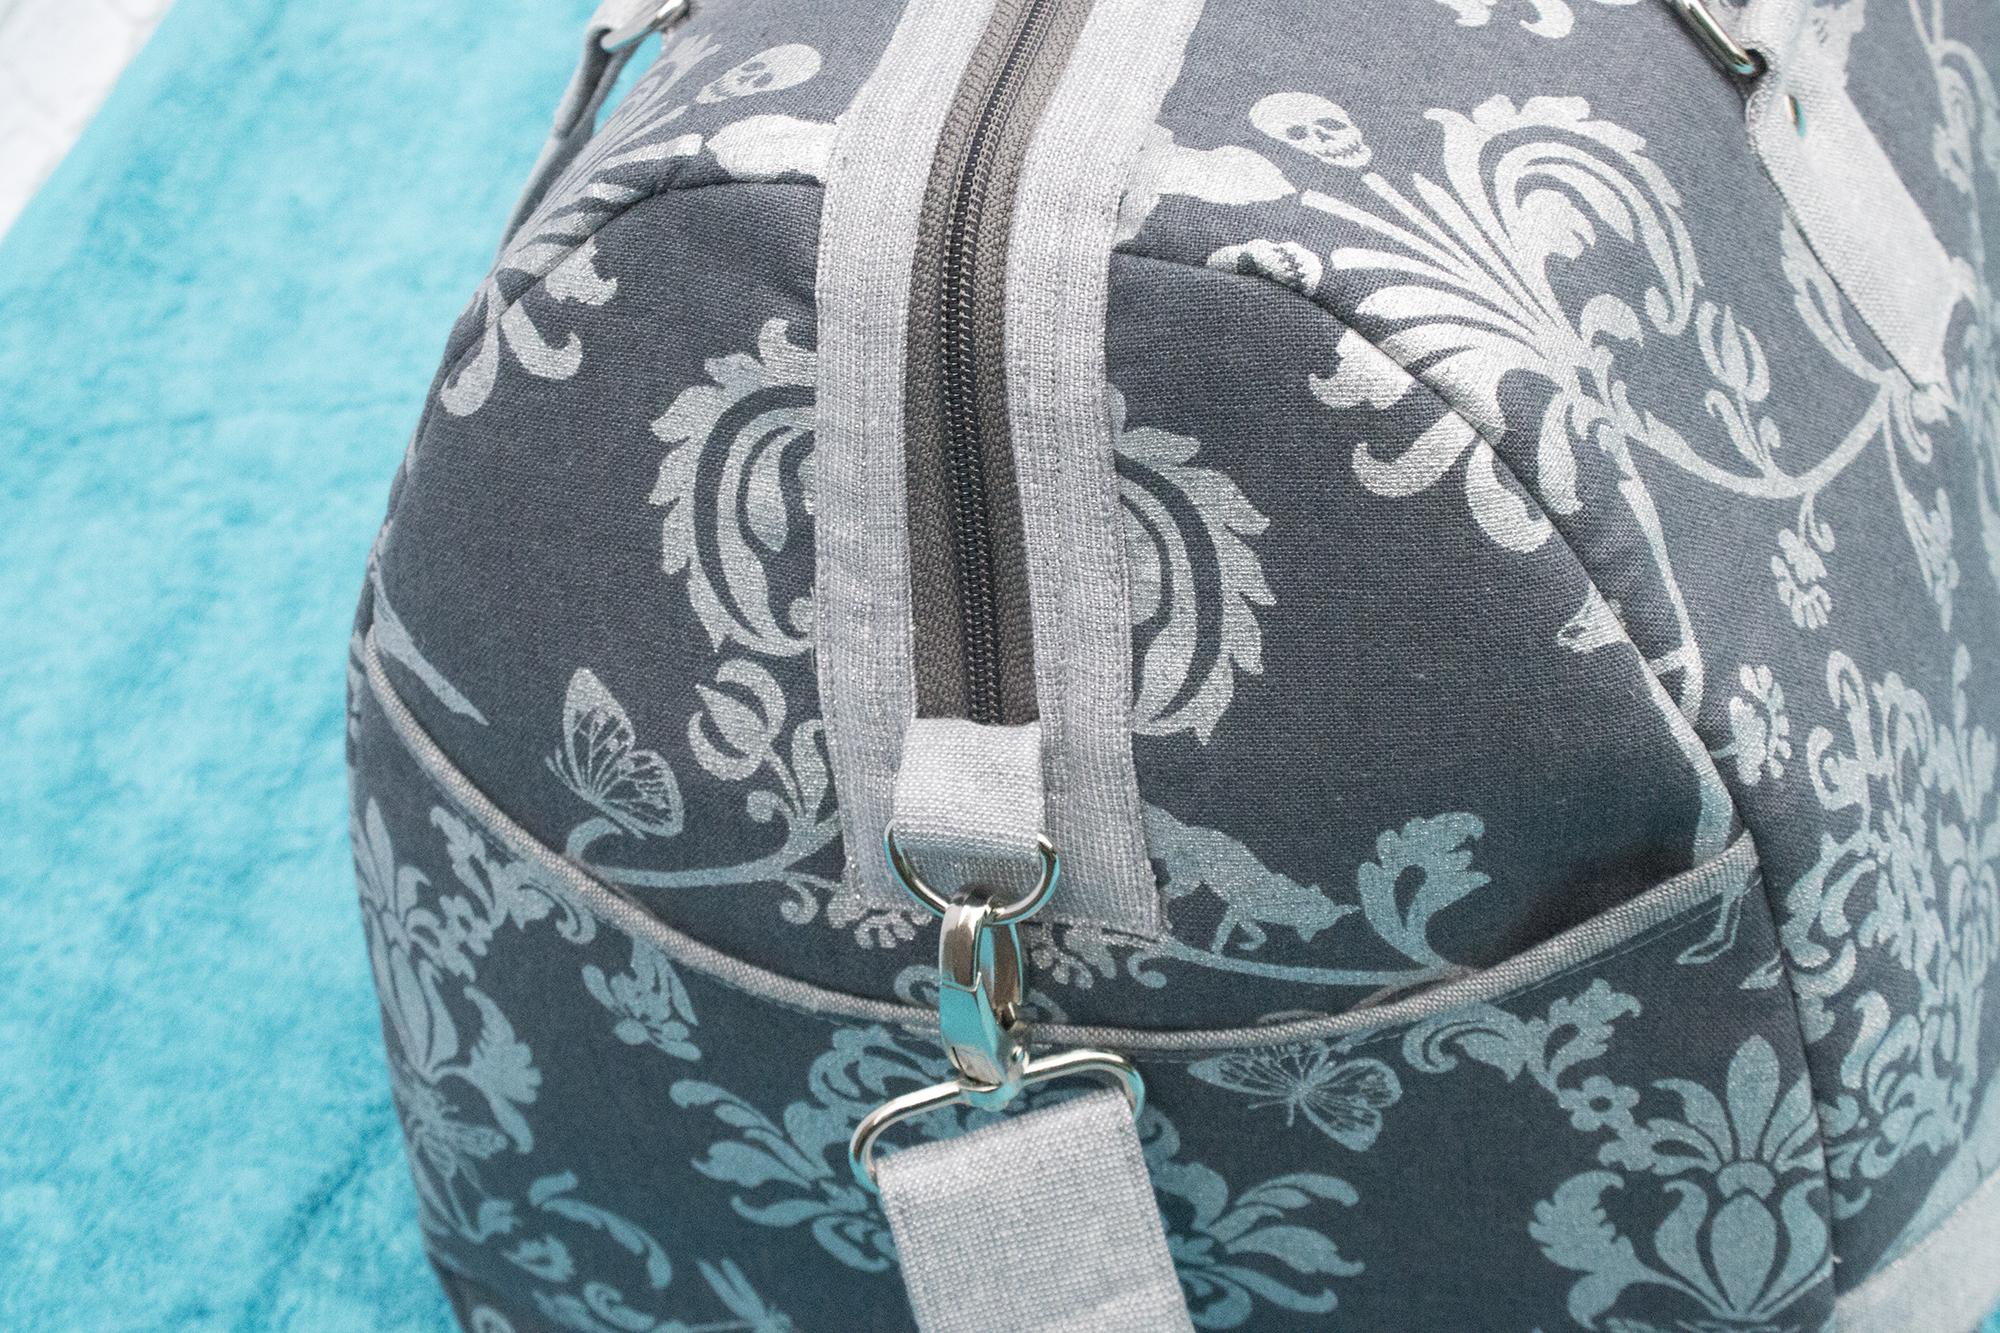 Sew Sweetness Coalition Bag sewing pattern